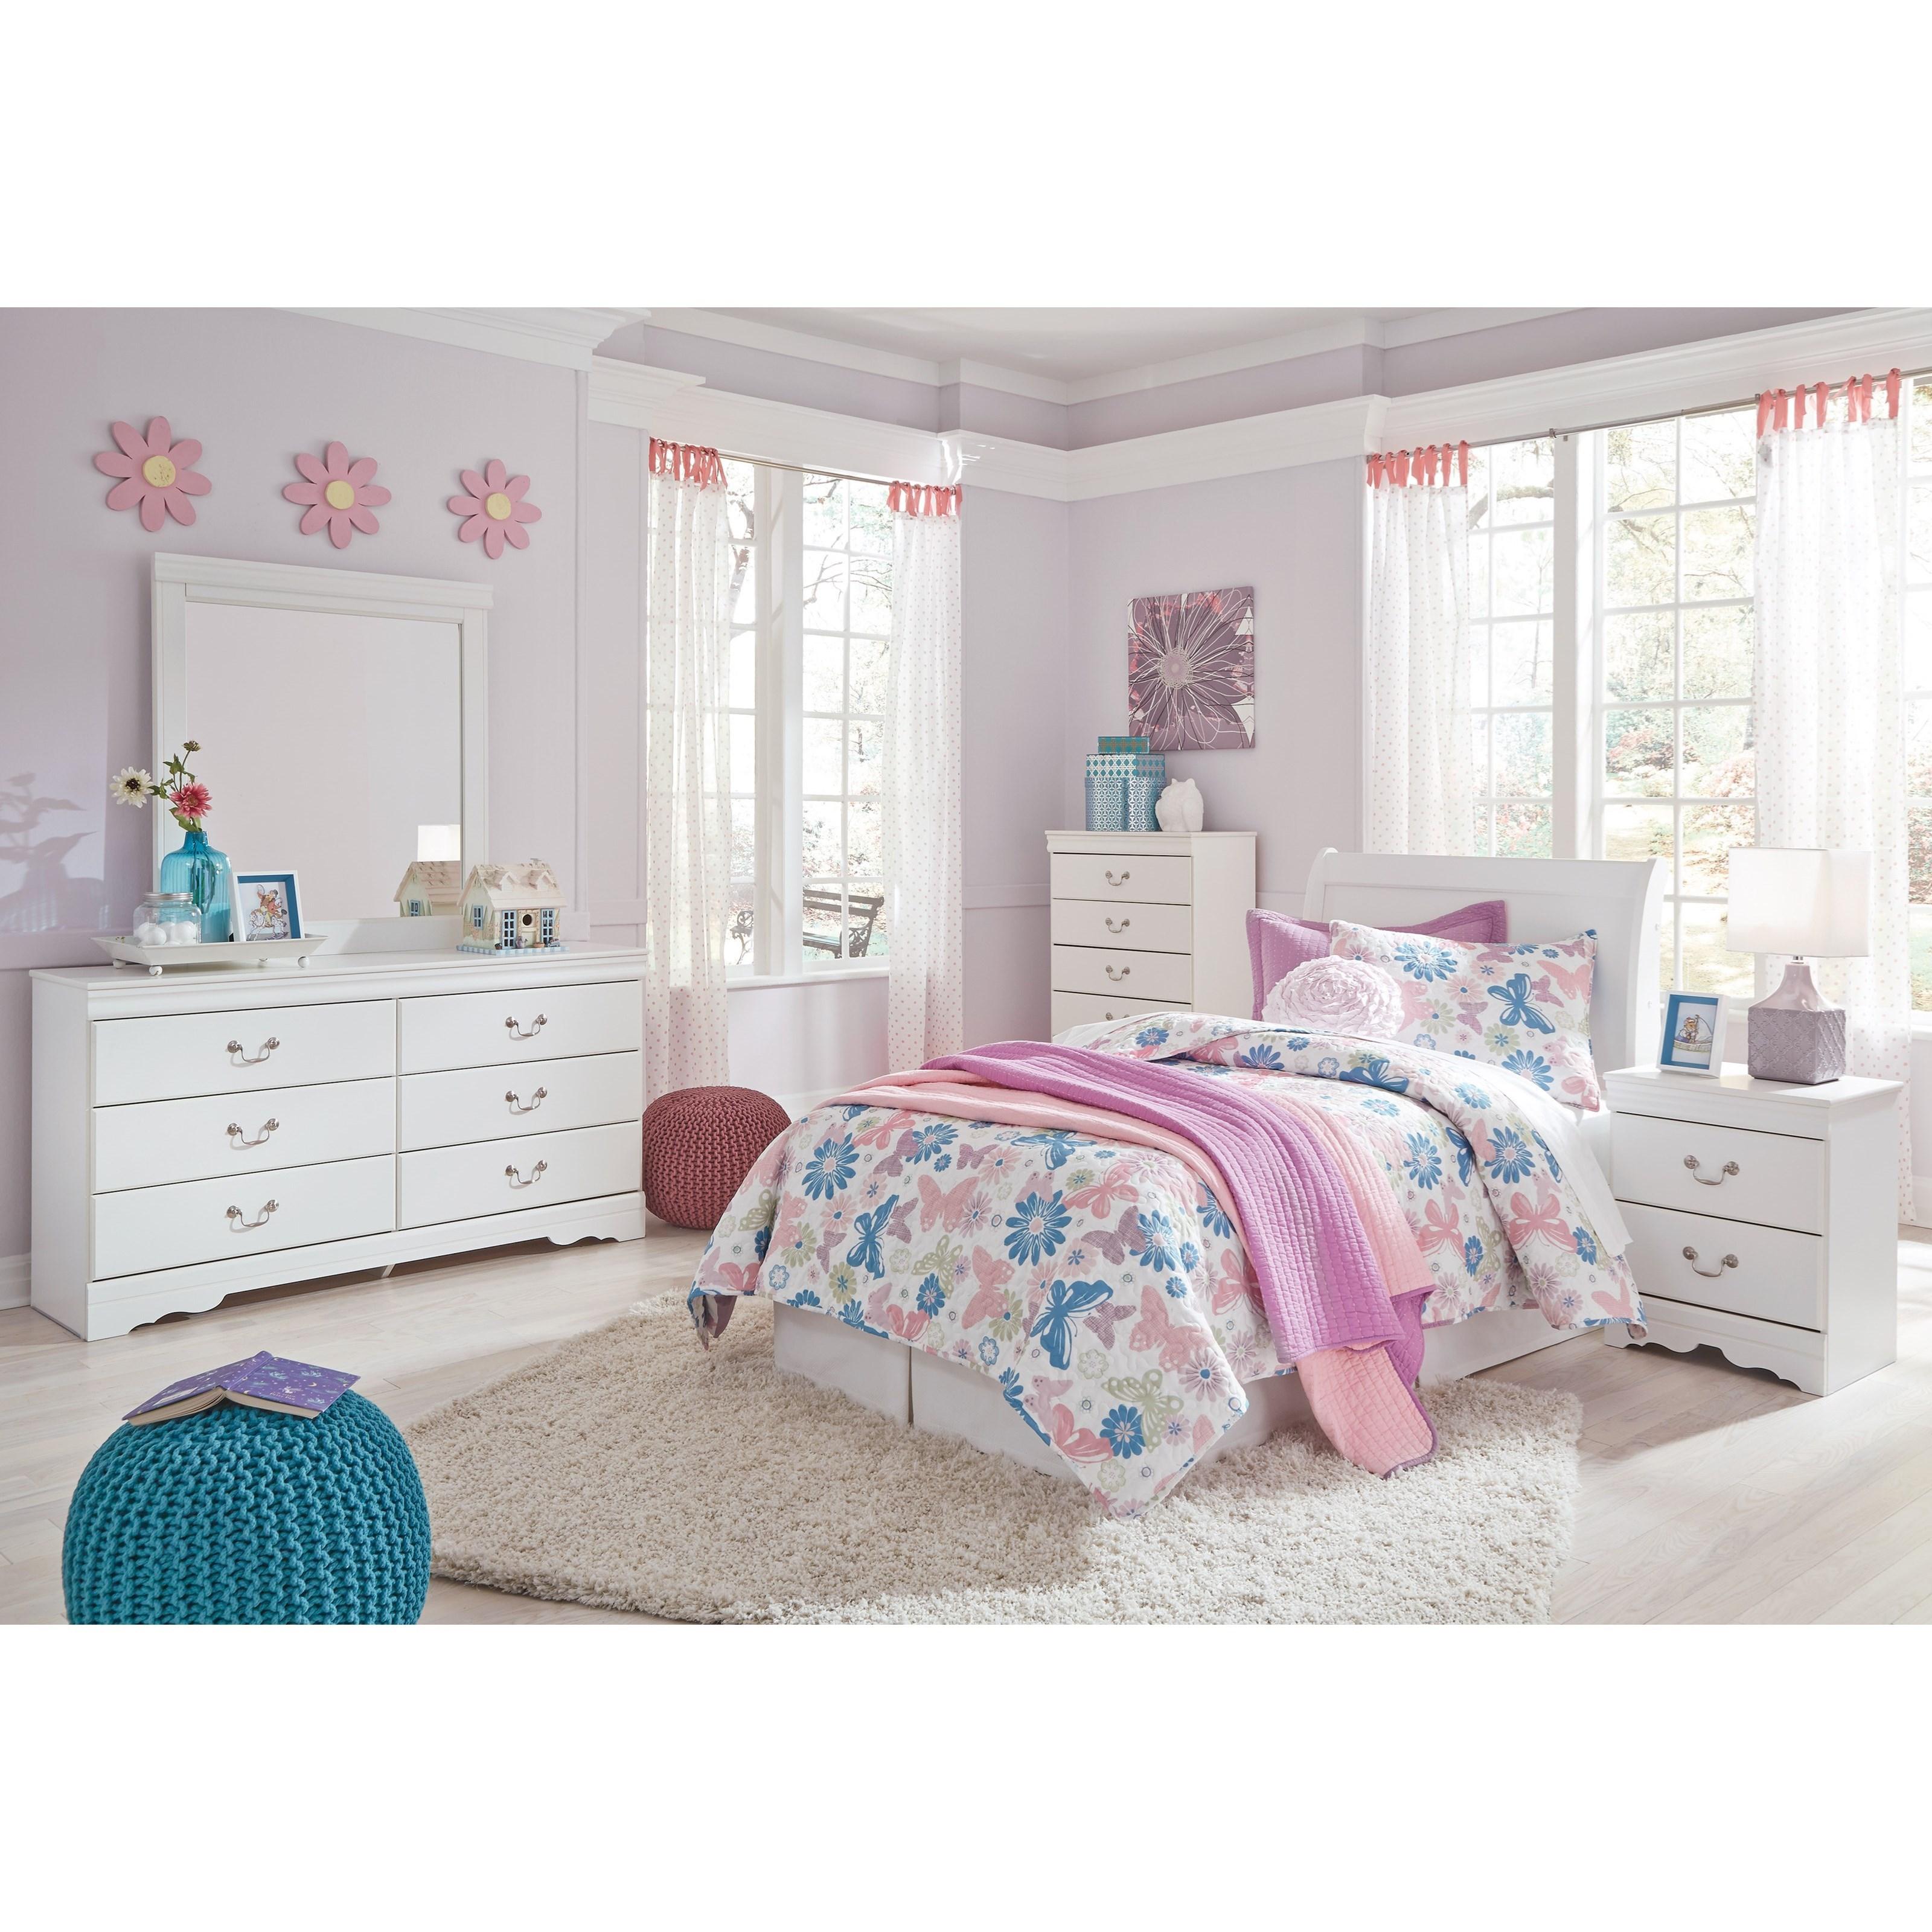 Anarasia Twin Bedroom Group by Ashley (Signature Design) at Johnny Janosik